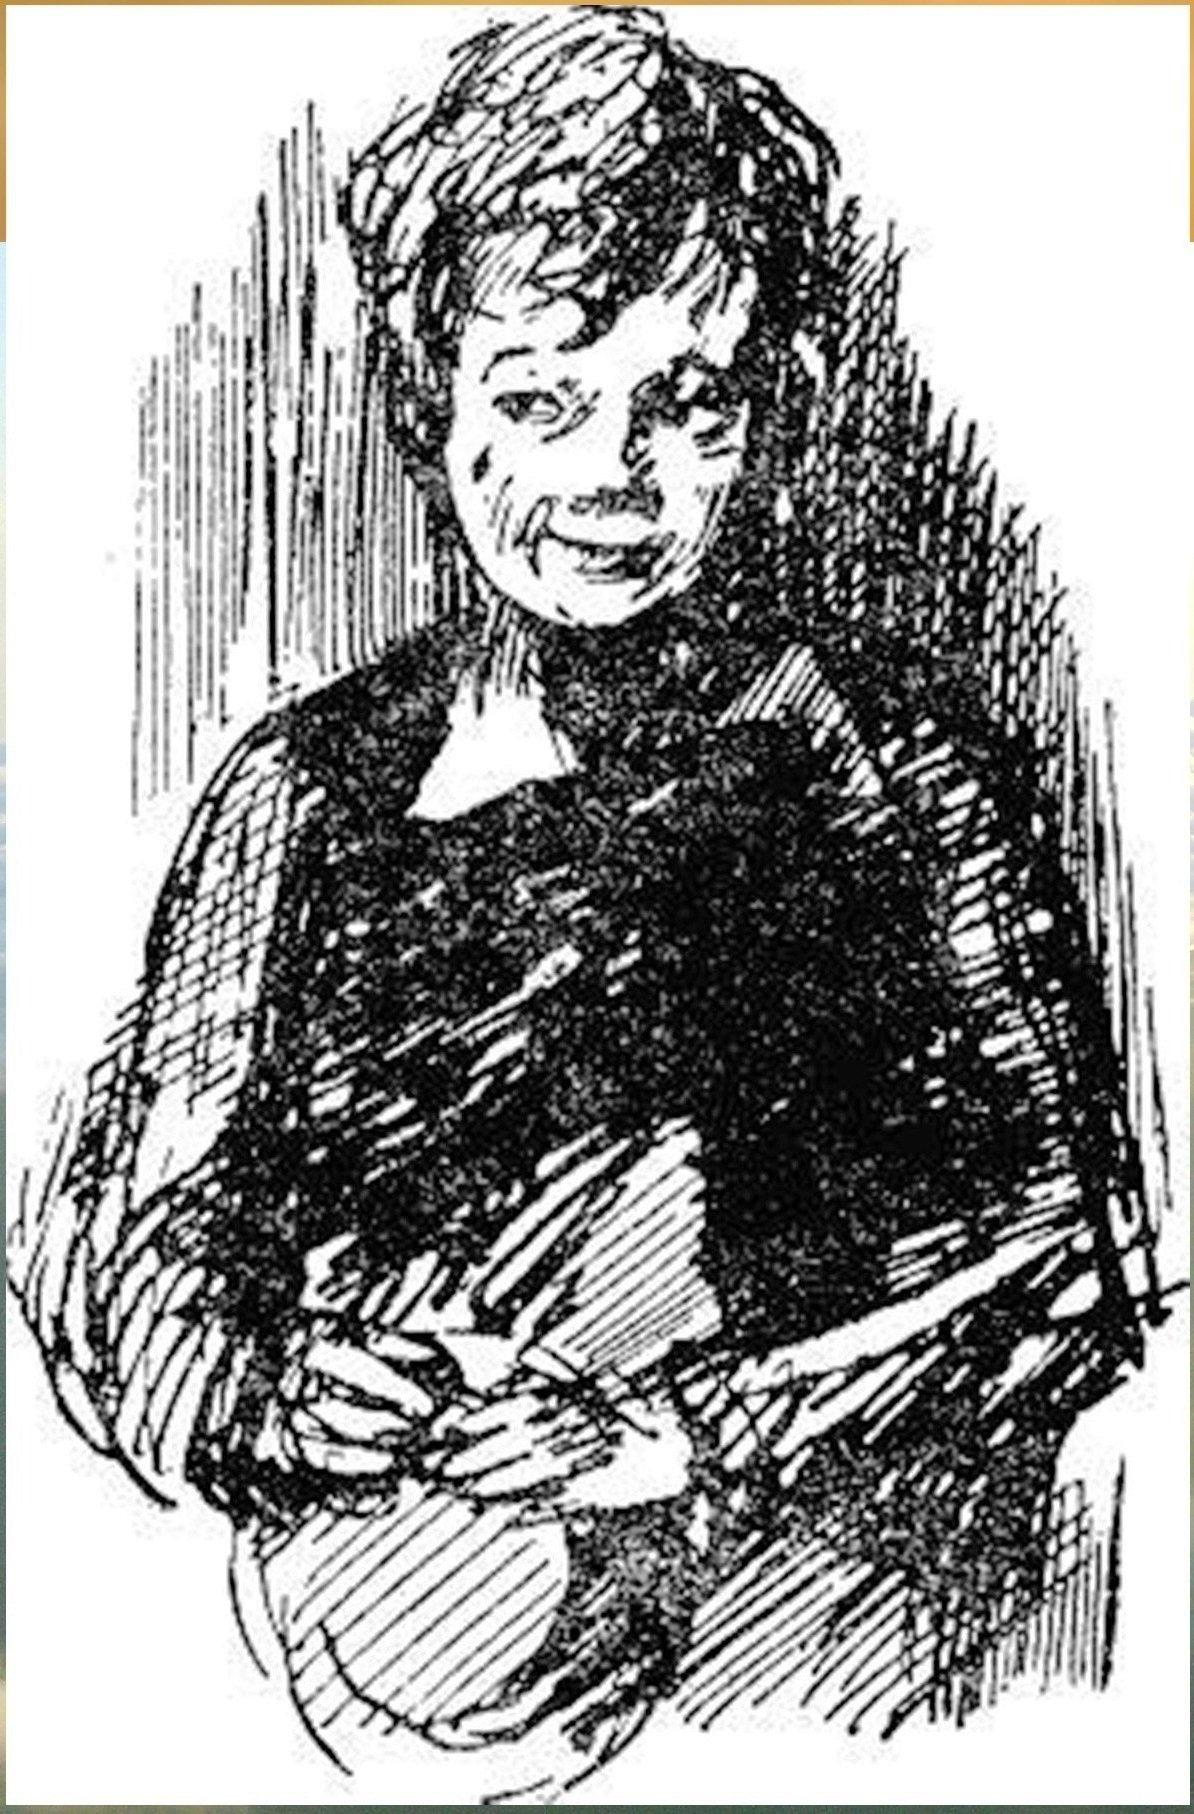 Иллюстрация В. Н. Горяева к пр-ю М.Твена Приключения Тома Сойера (17).